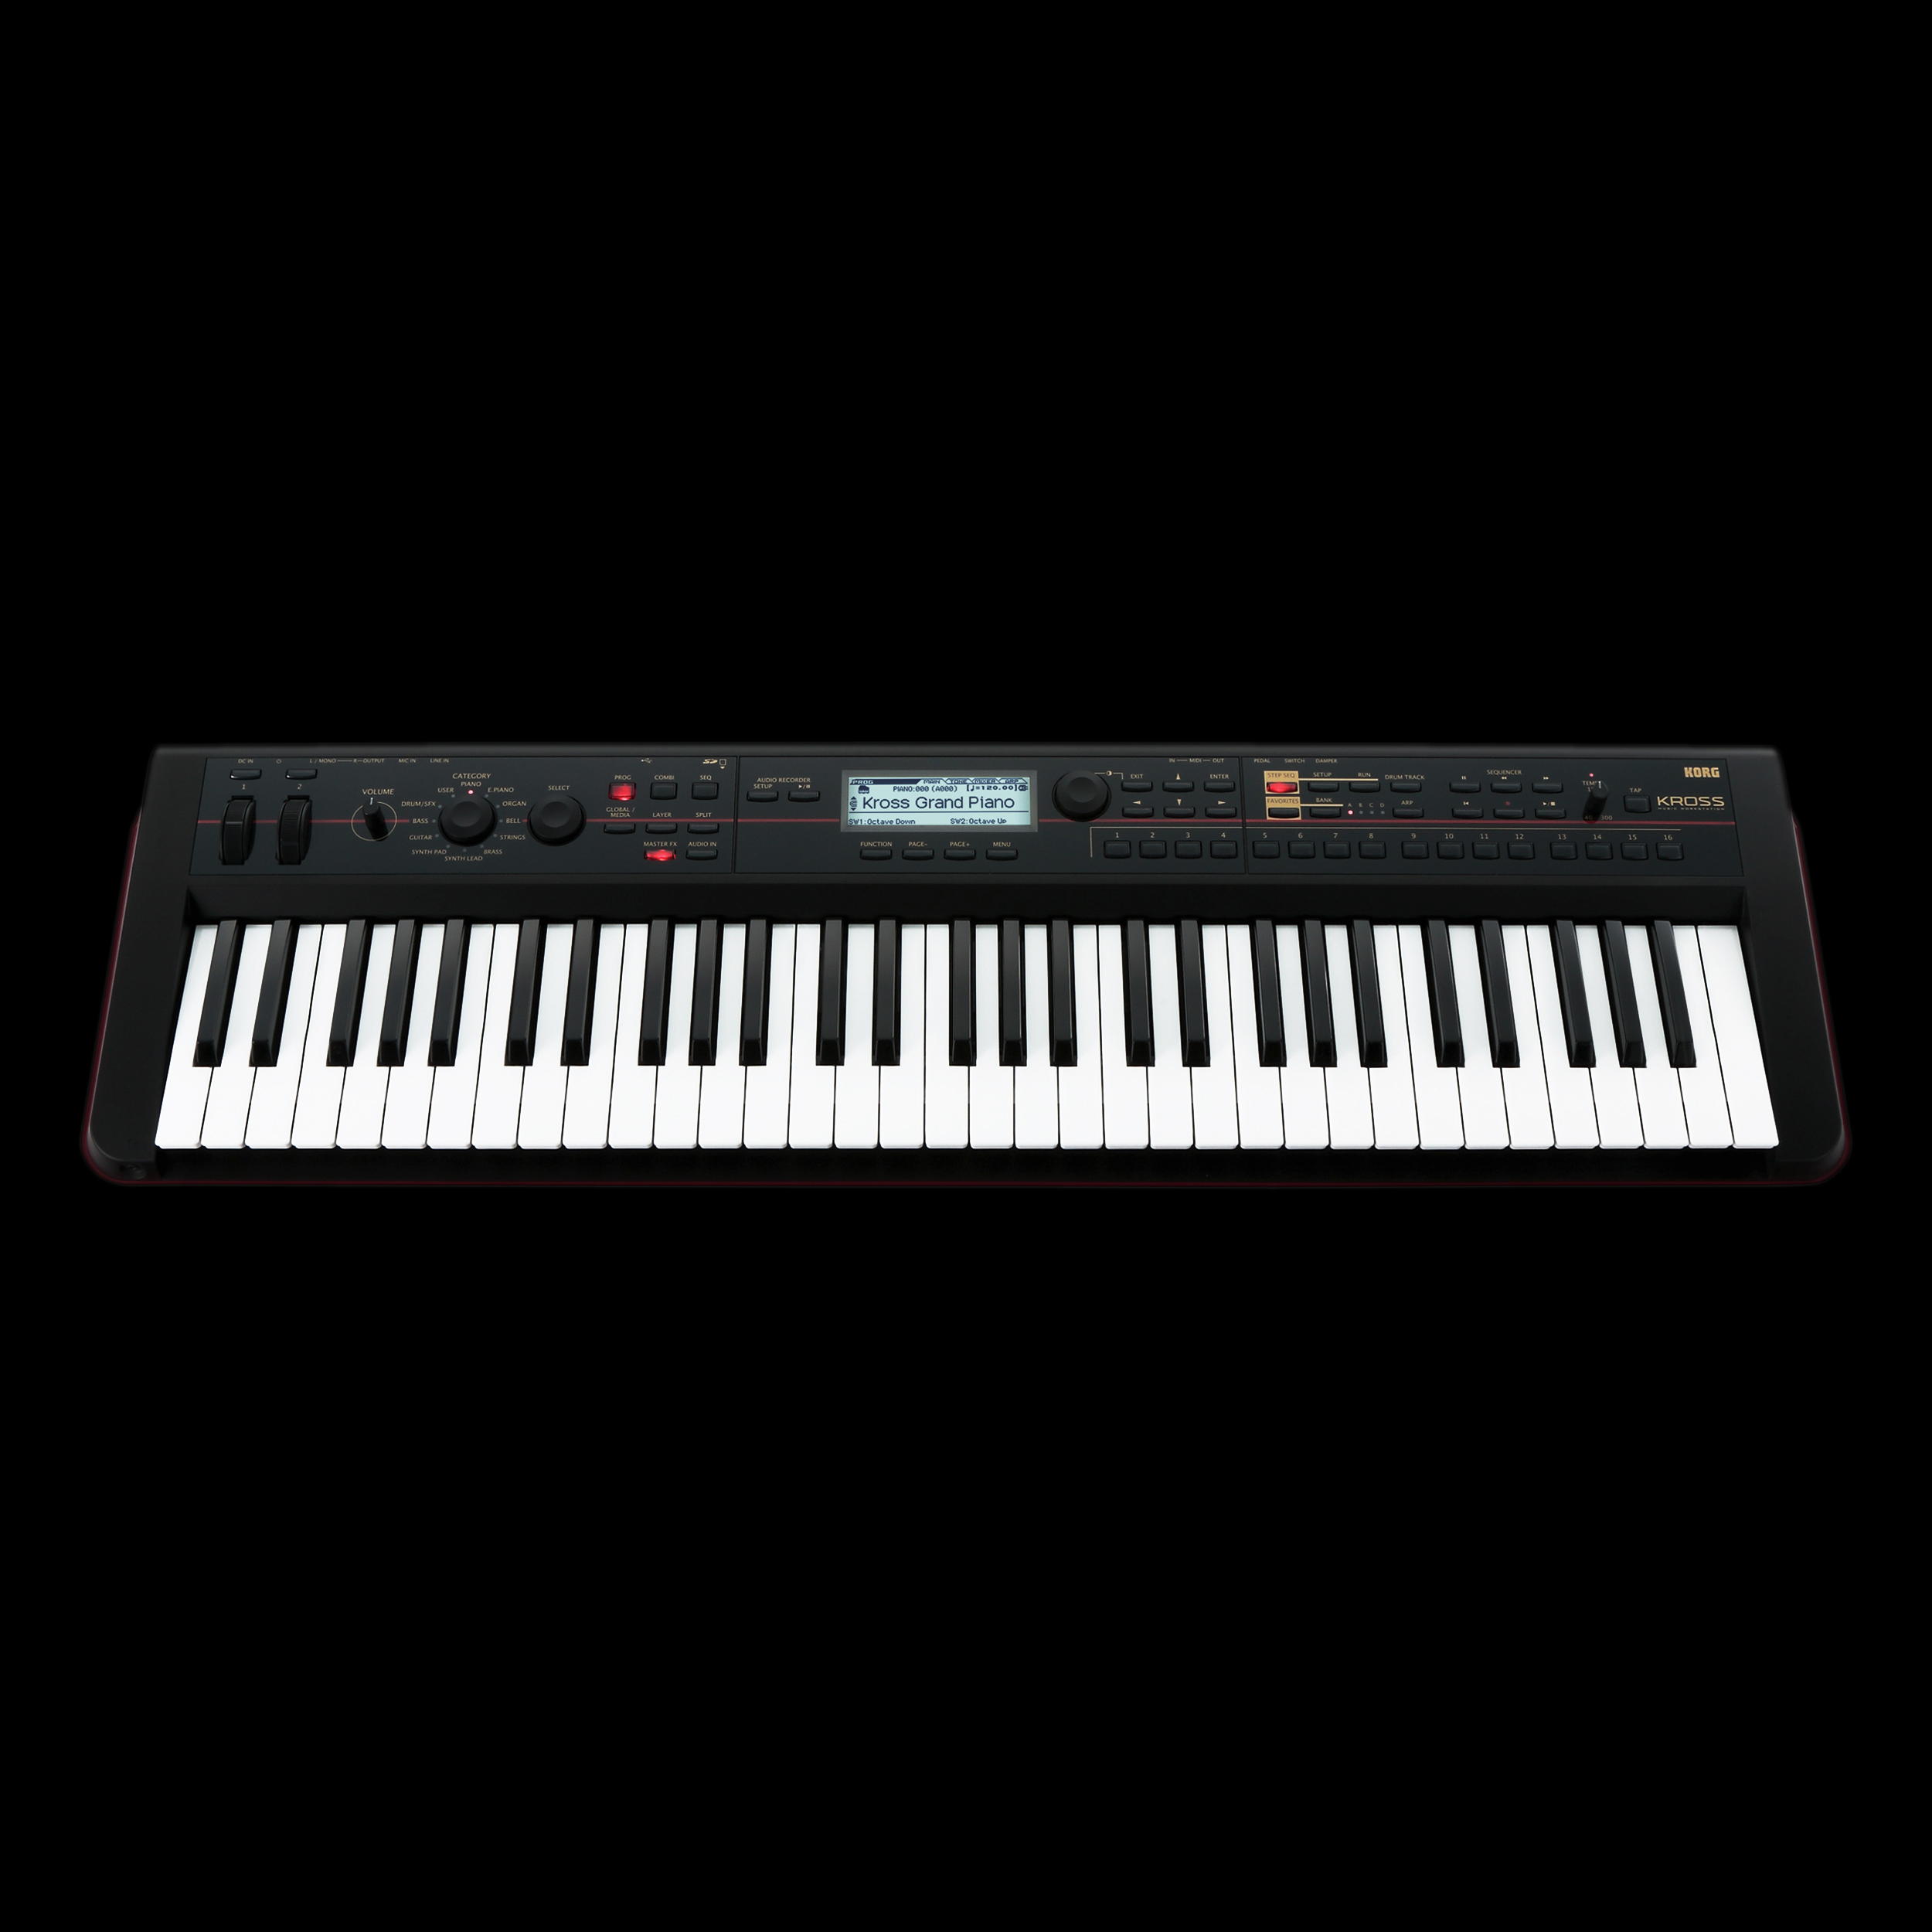 korg kross61 kross 61 synthesizer workstation keyboard 61 note key sequencer ebay